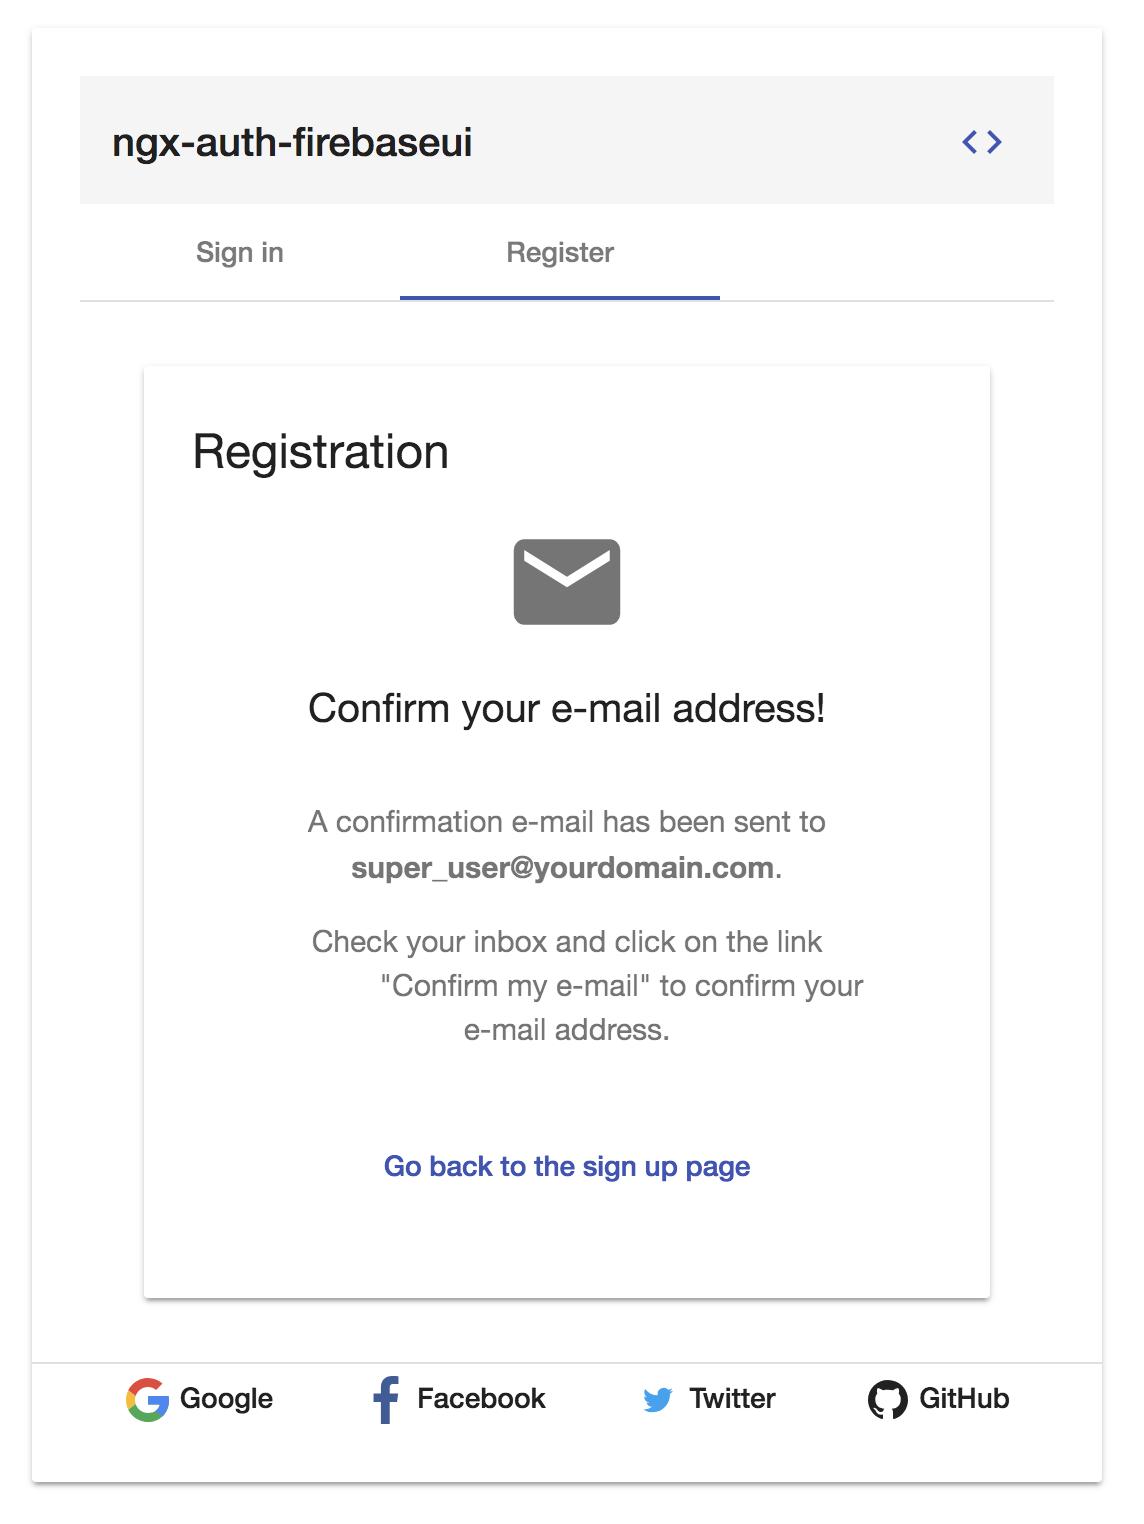 ngx-auth-firebaseui sign up